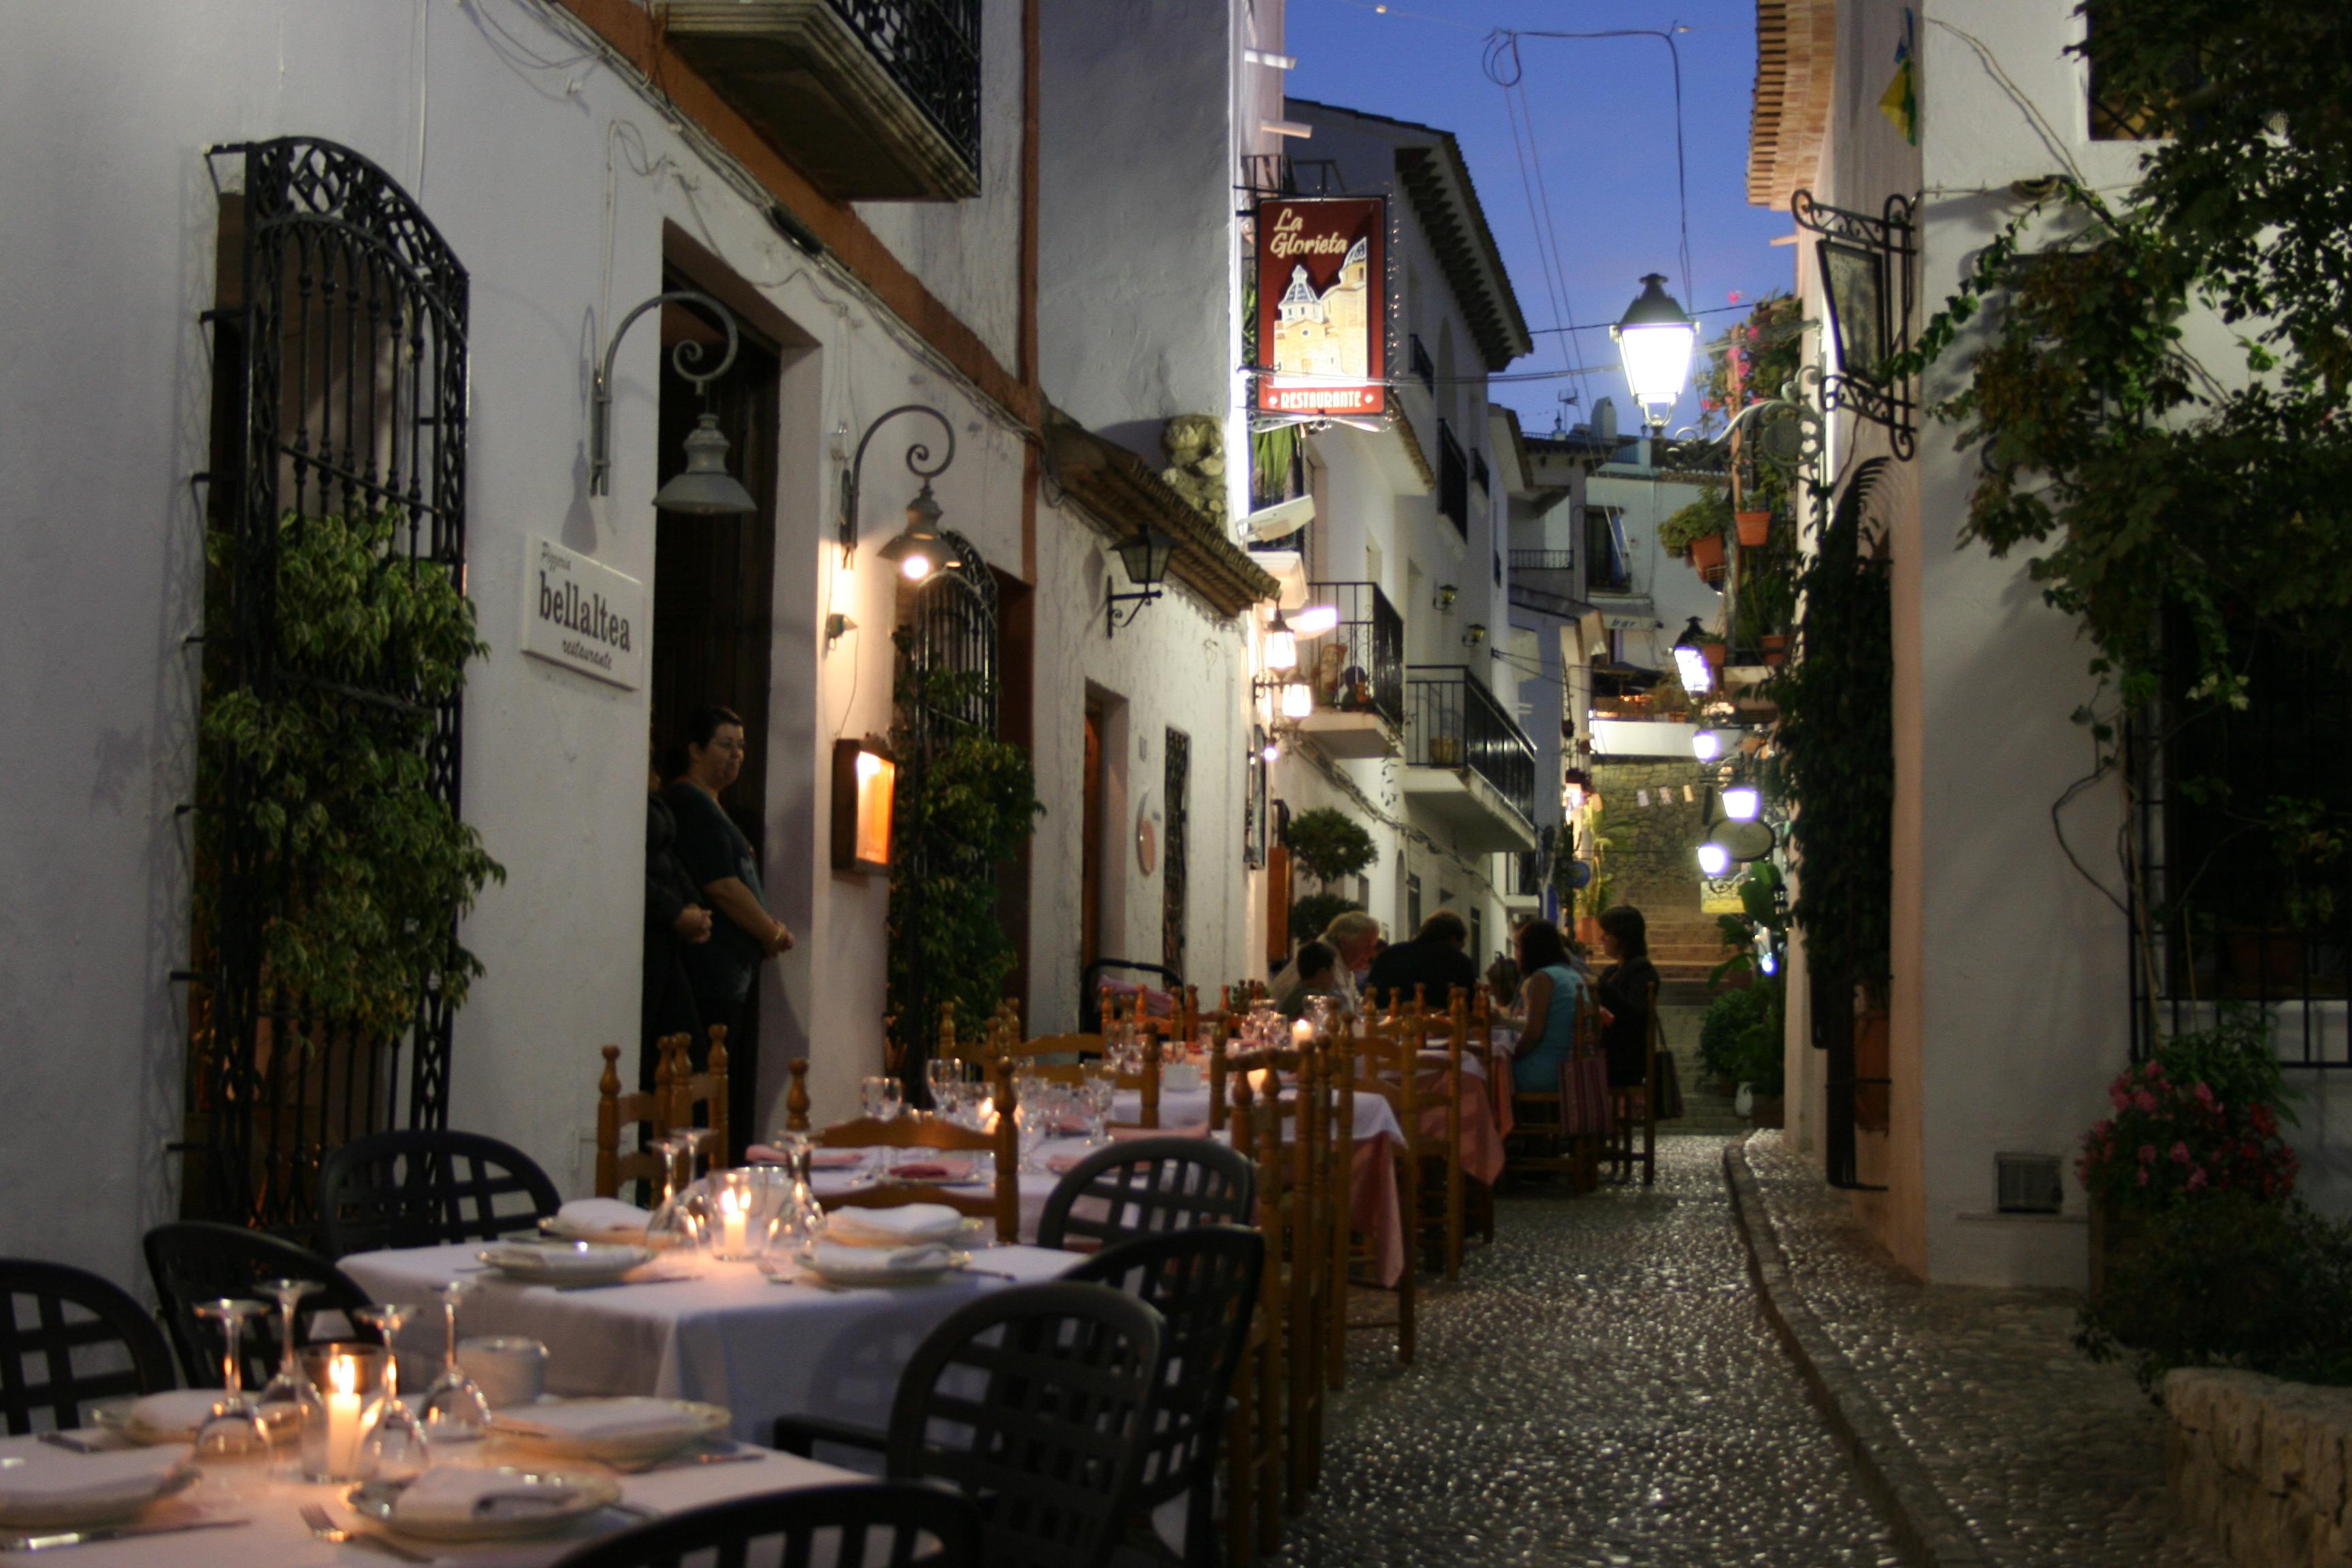 Restaurantes. Guía de viaje de Altea. Tu Maleta.